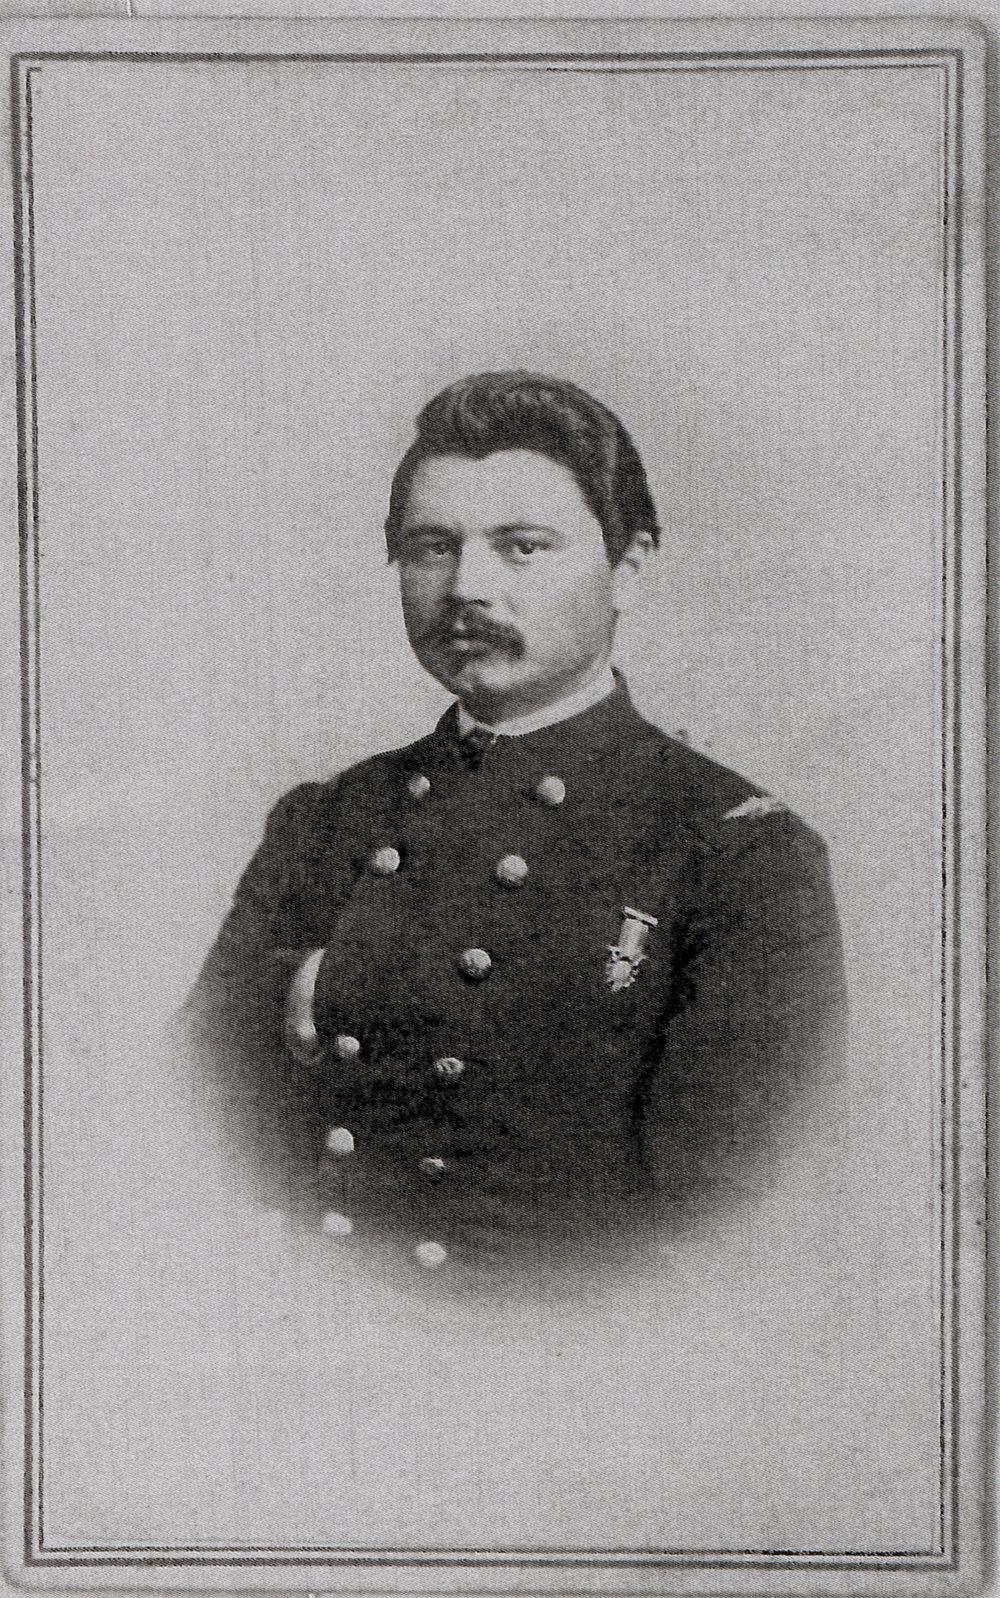 Col. John Pulford